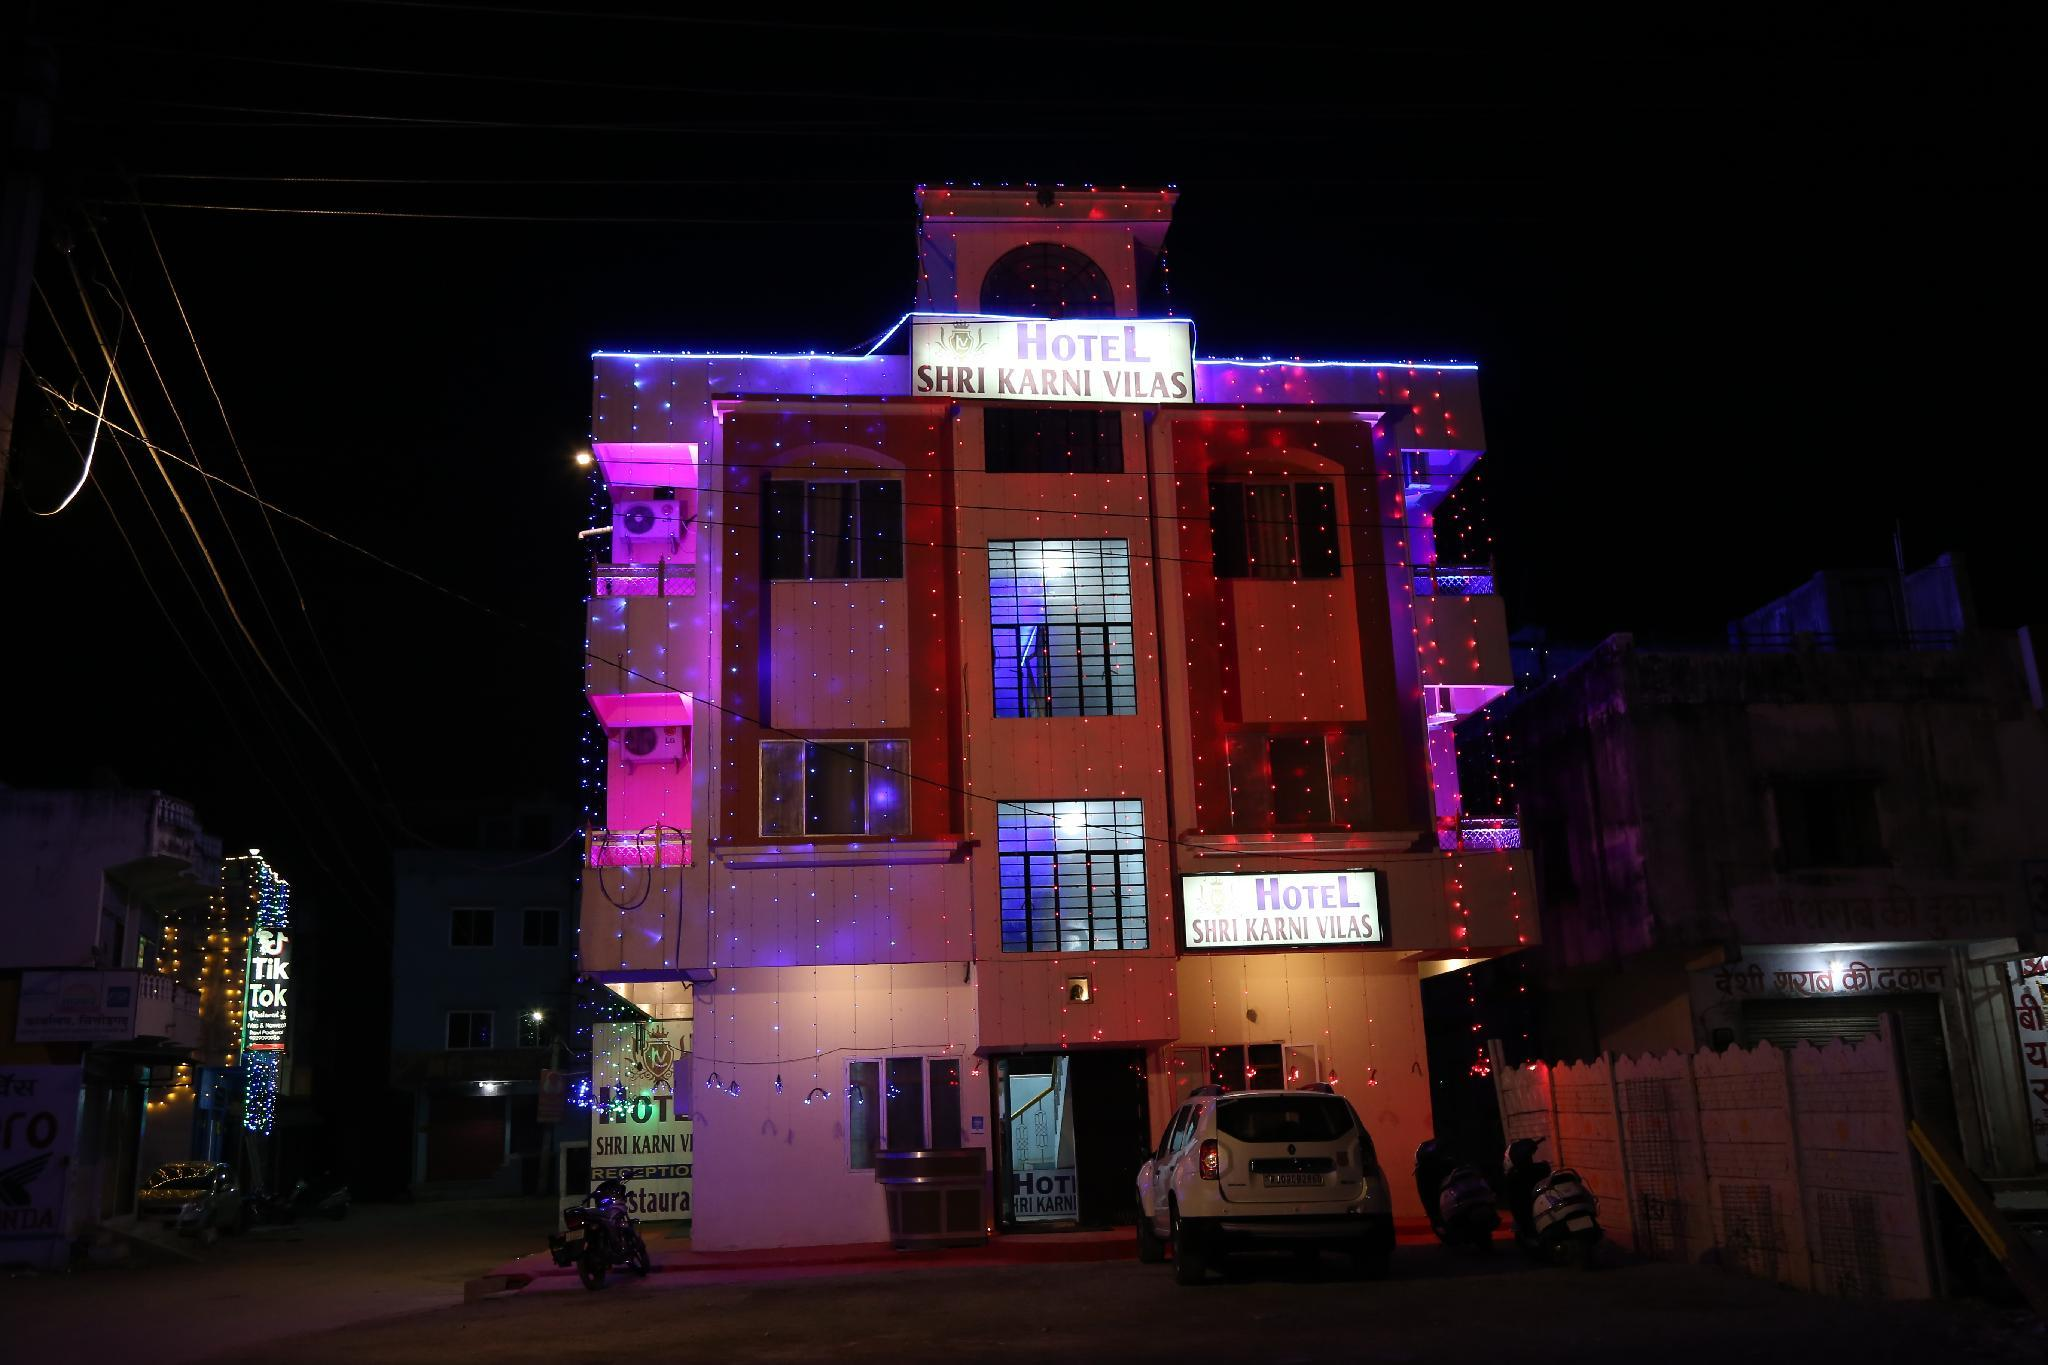 Hotel Shri Karani Vilas